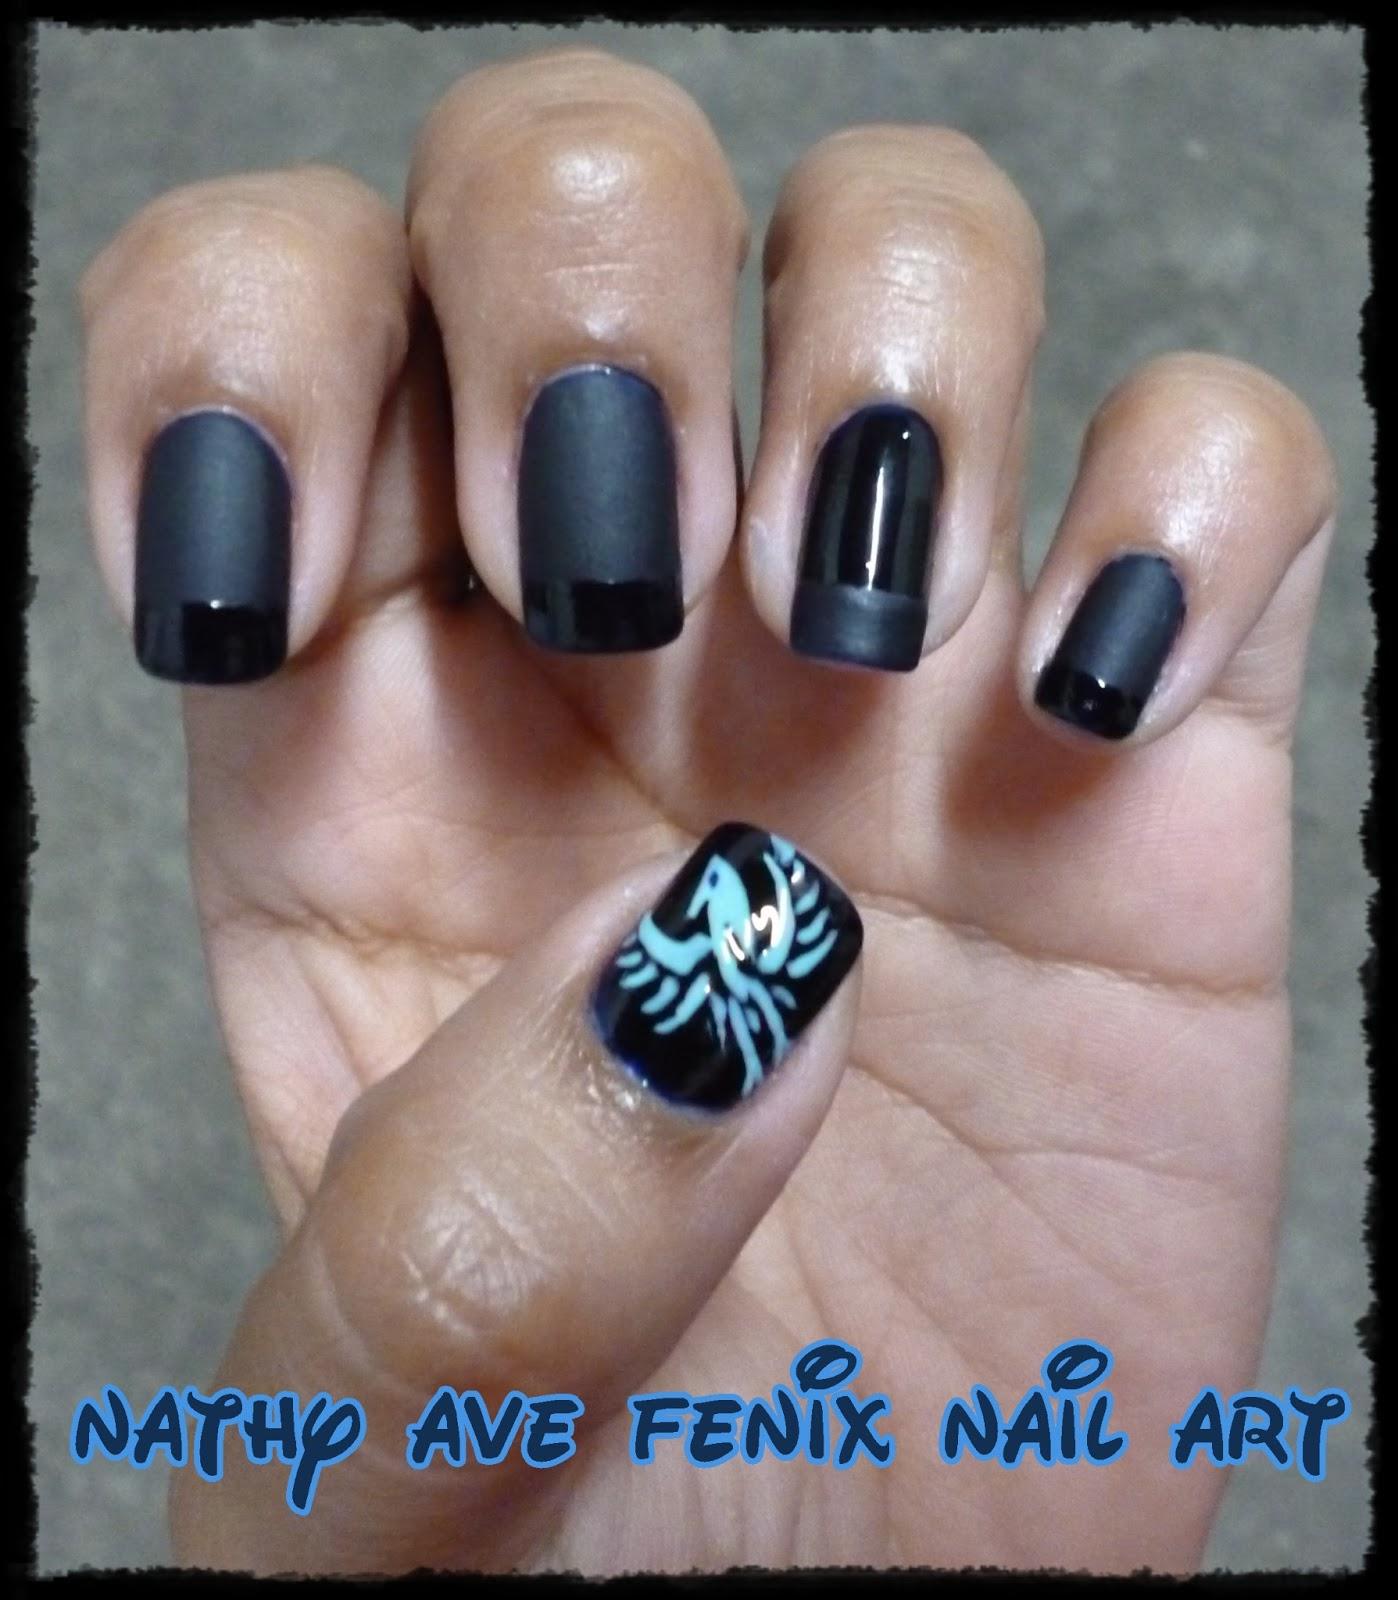 Nail Art Pik Avenue: NATHY AVE FENIX NAIL ART